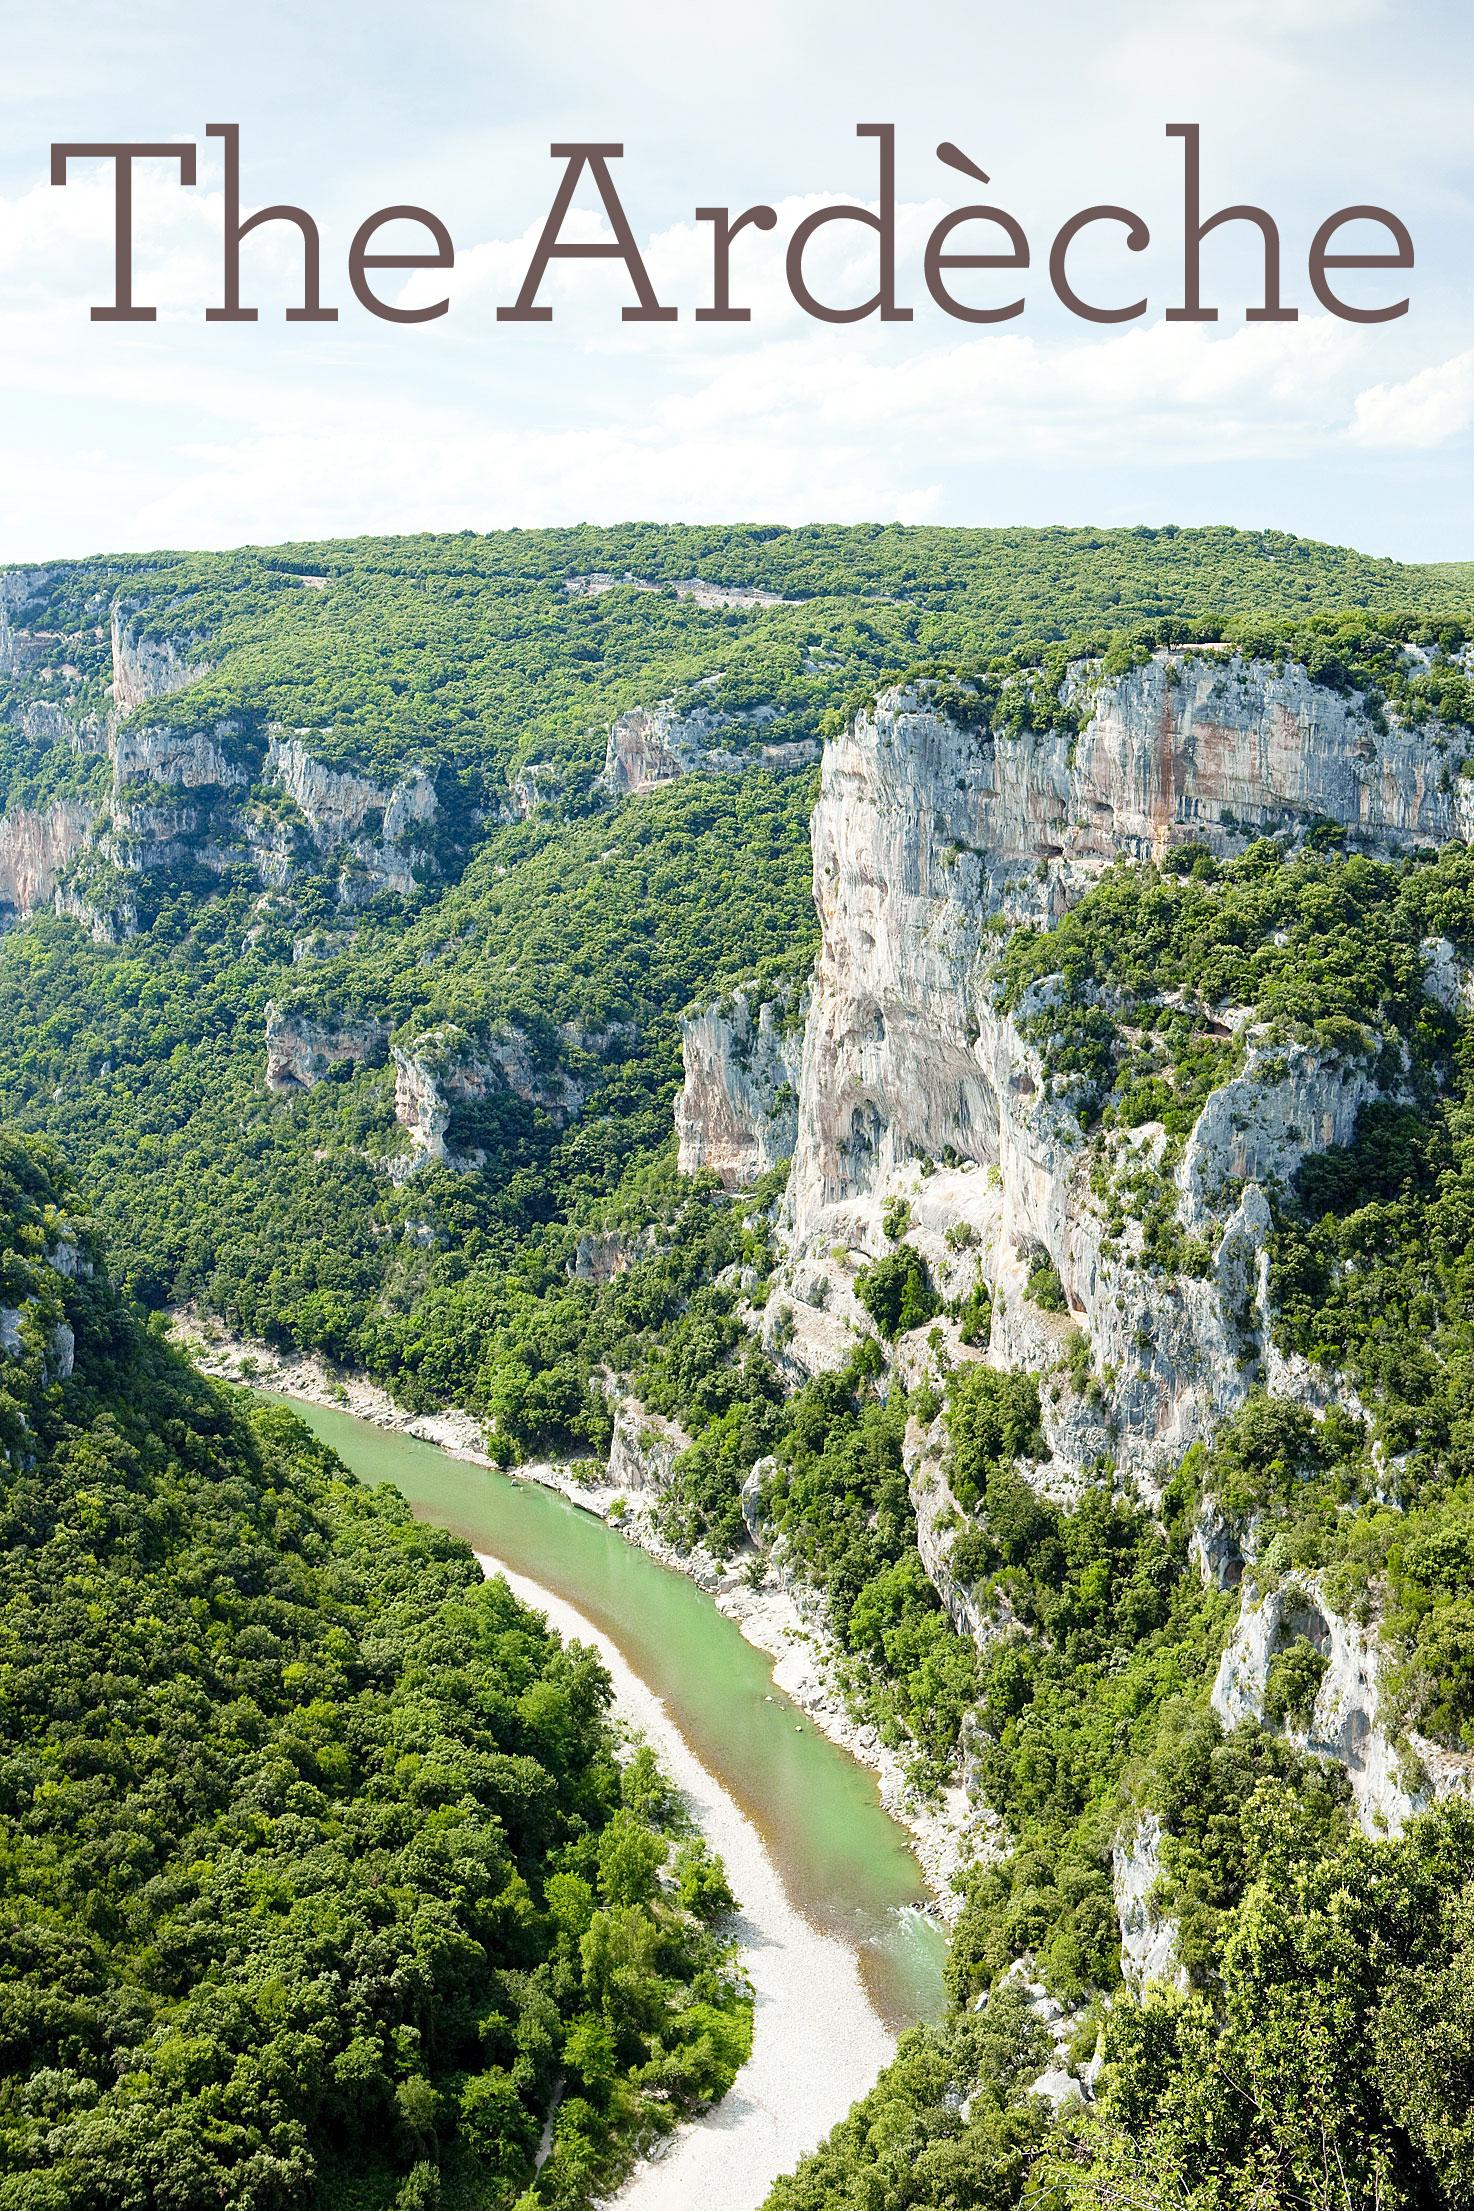 The Ardèche in the Rhône-Alps